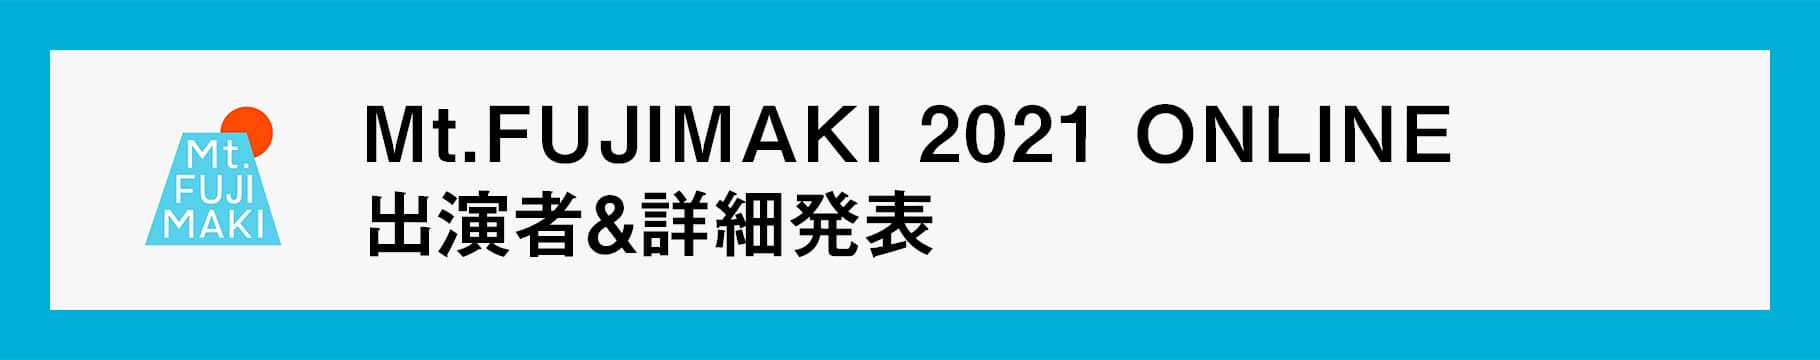 「Mt.FUJIMAKI 2021 ONLINE」出演者&詳細発表